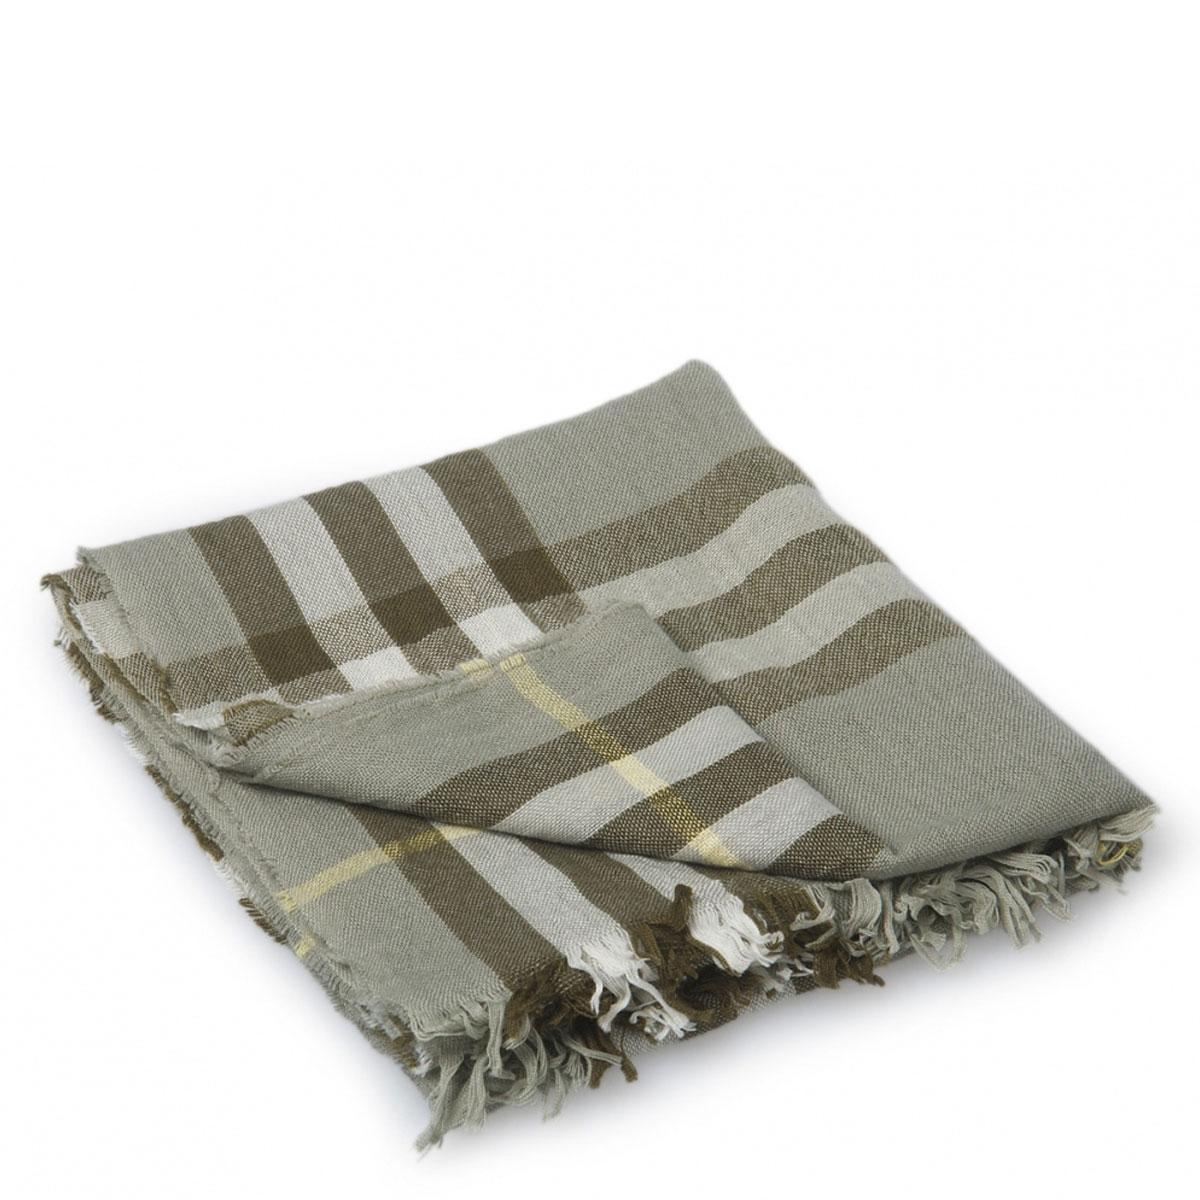 【BURBERRY博柏利 围巾】Burberry 柏博利浅灰色格子条纹围巾 【正品 价格 图片】 - 寺库网